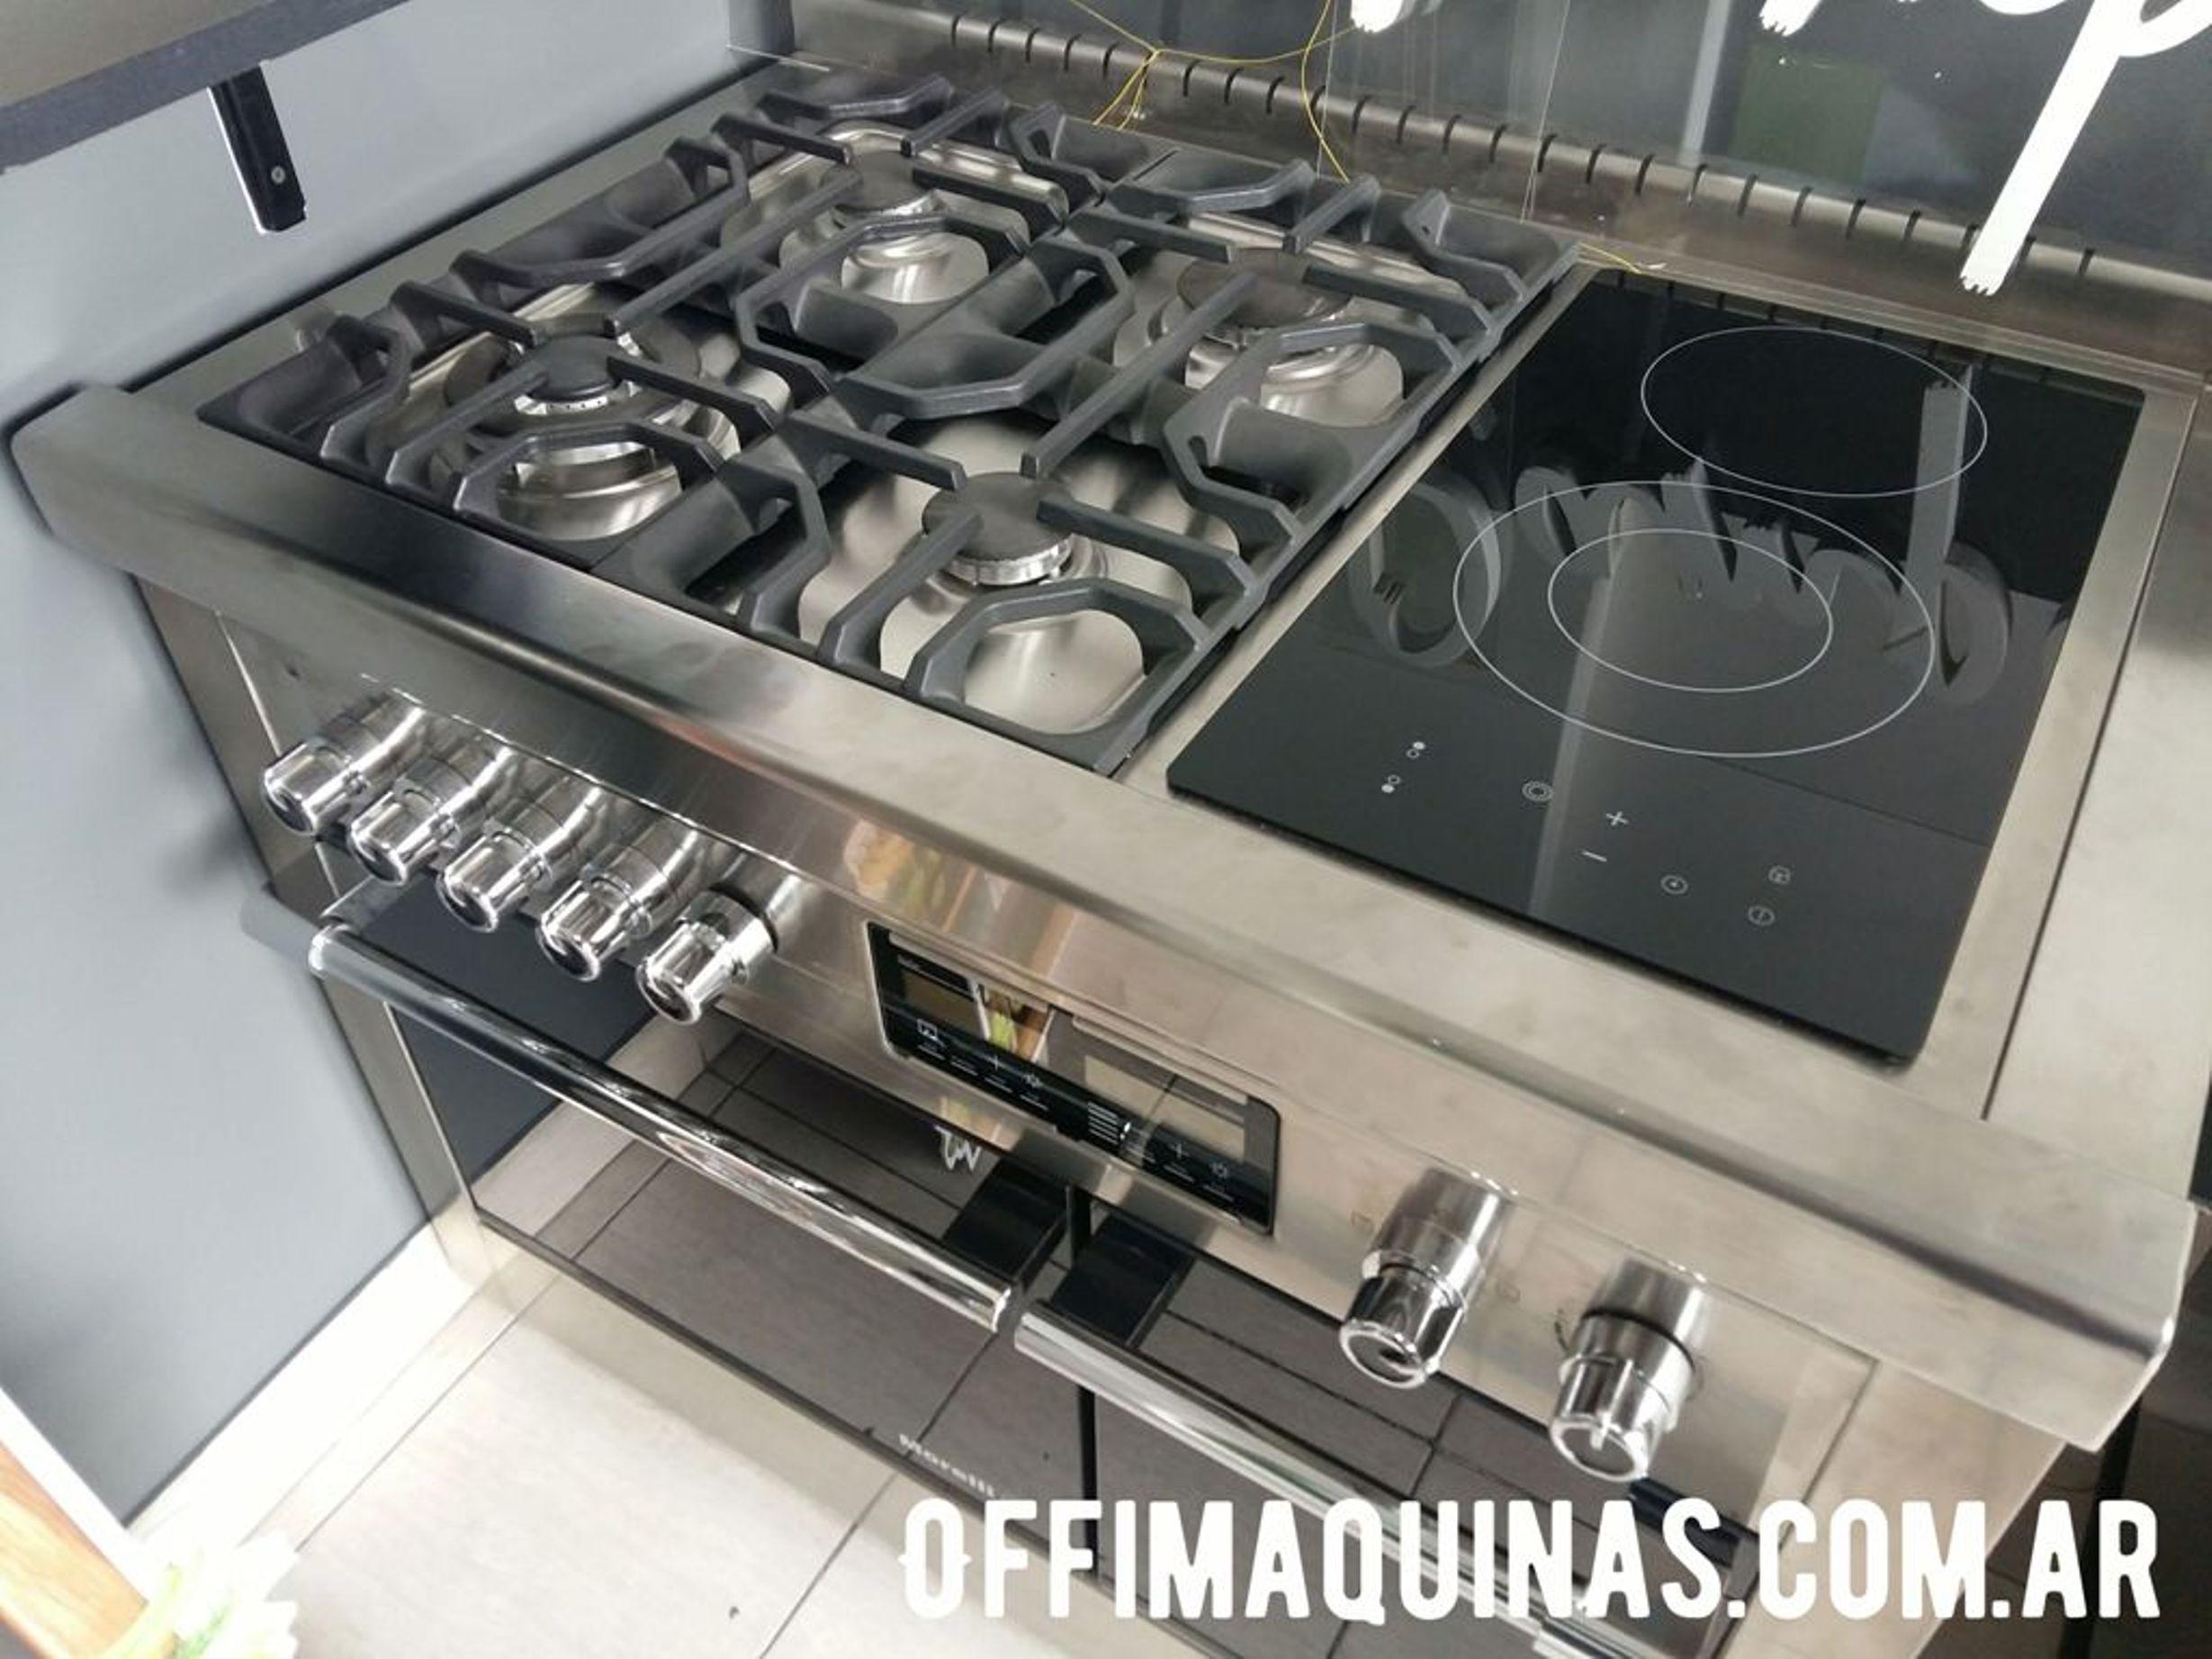 Morelli dupplo cocina electrica y gas moderna familiar www.fabricainoxidable.com.ar